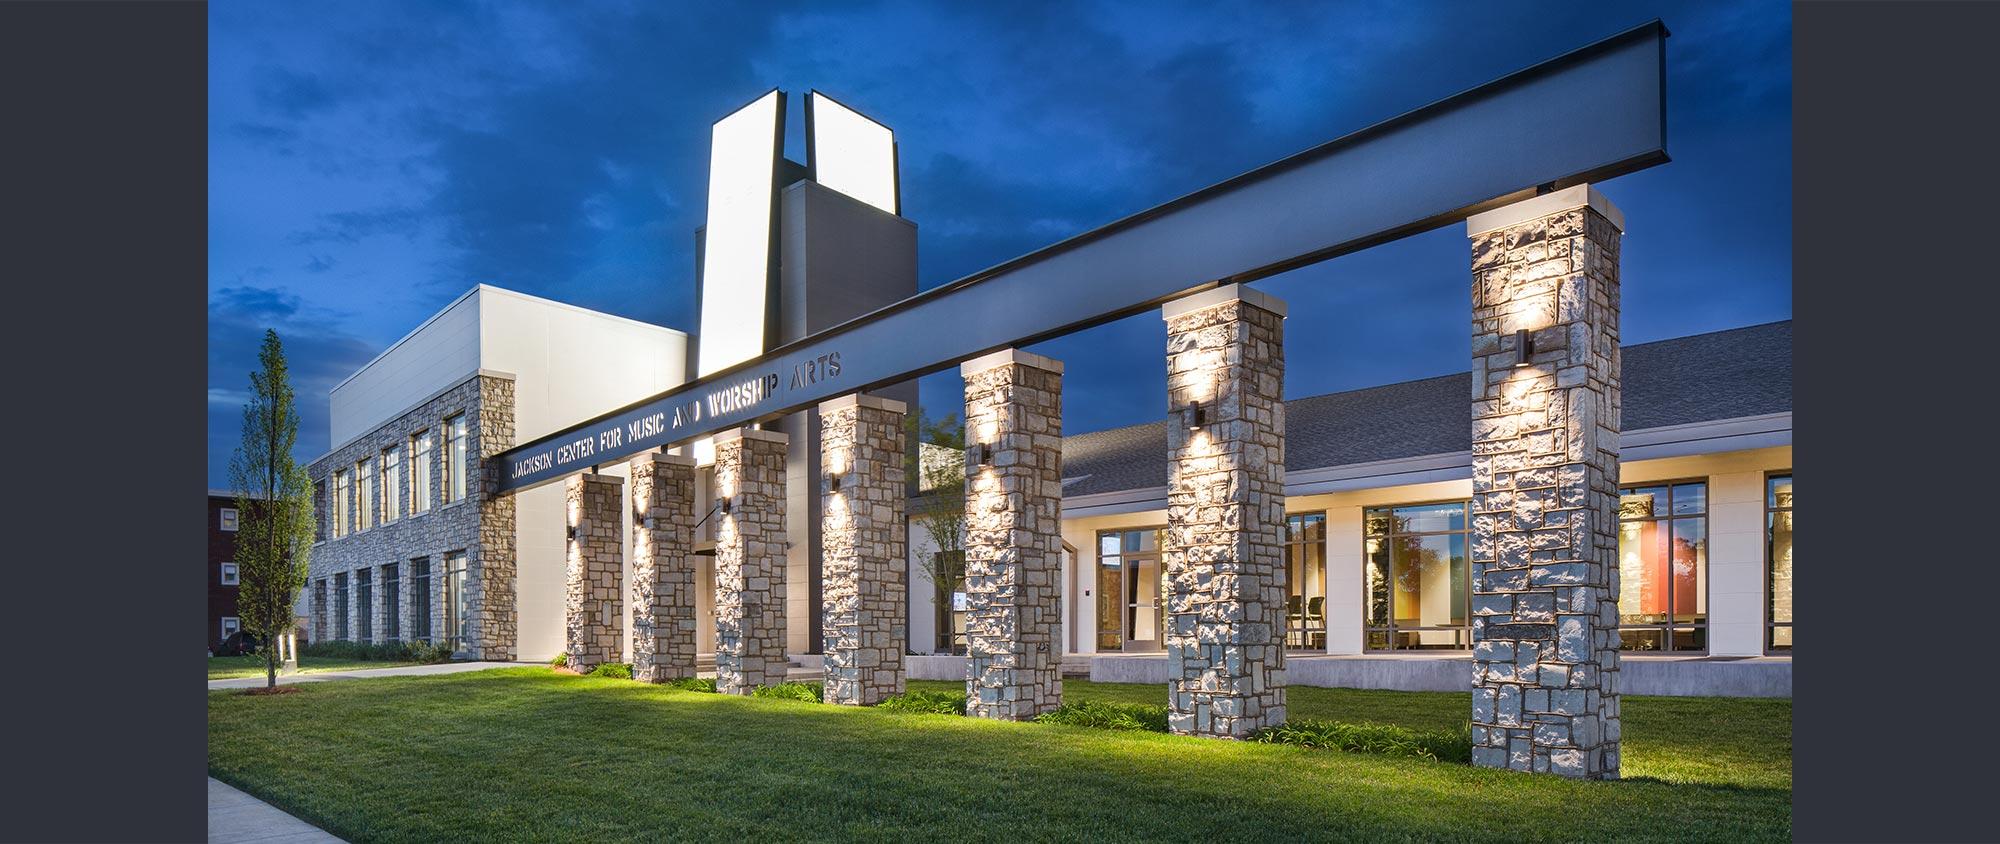 Trevecca Nazarene University Jackson Center for Music and Worship Arts